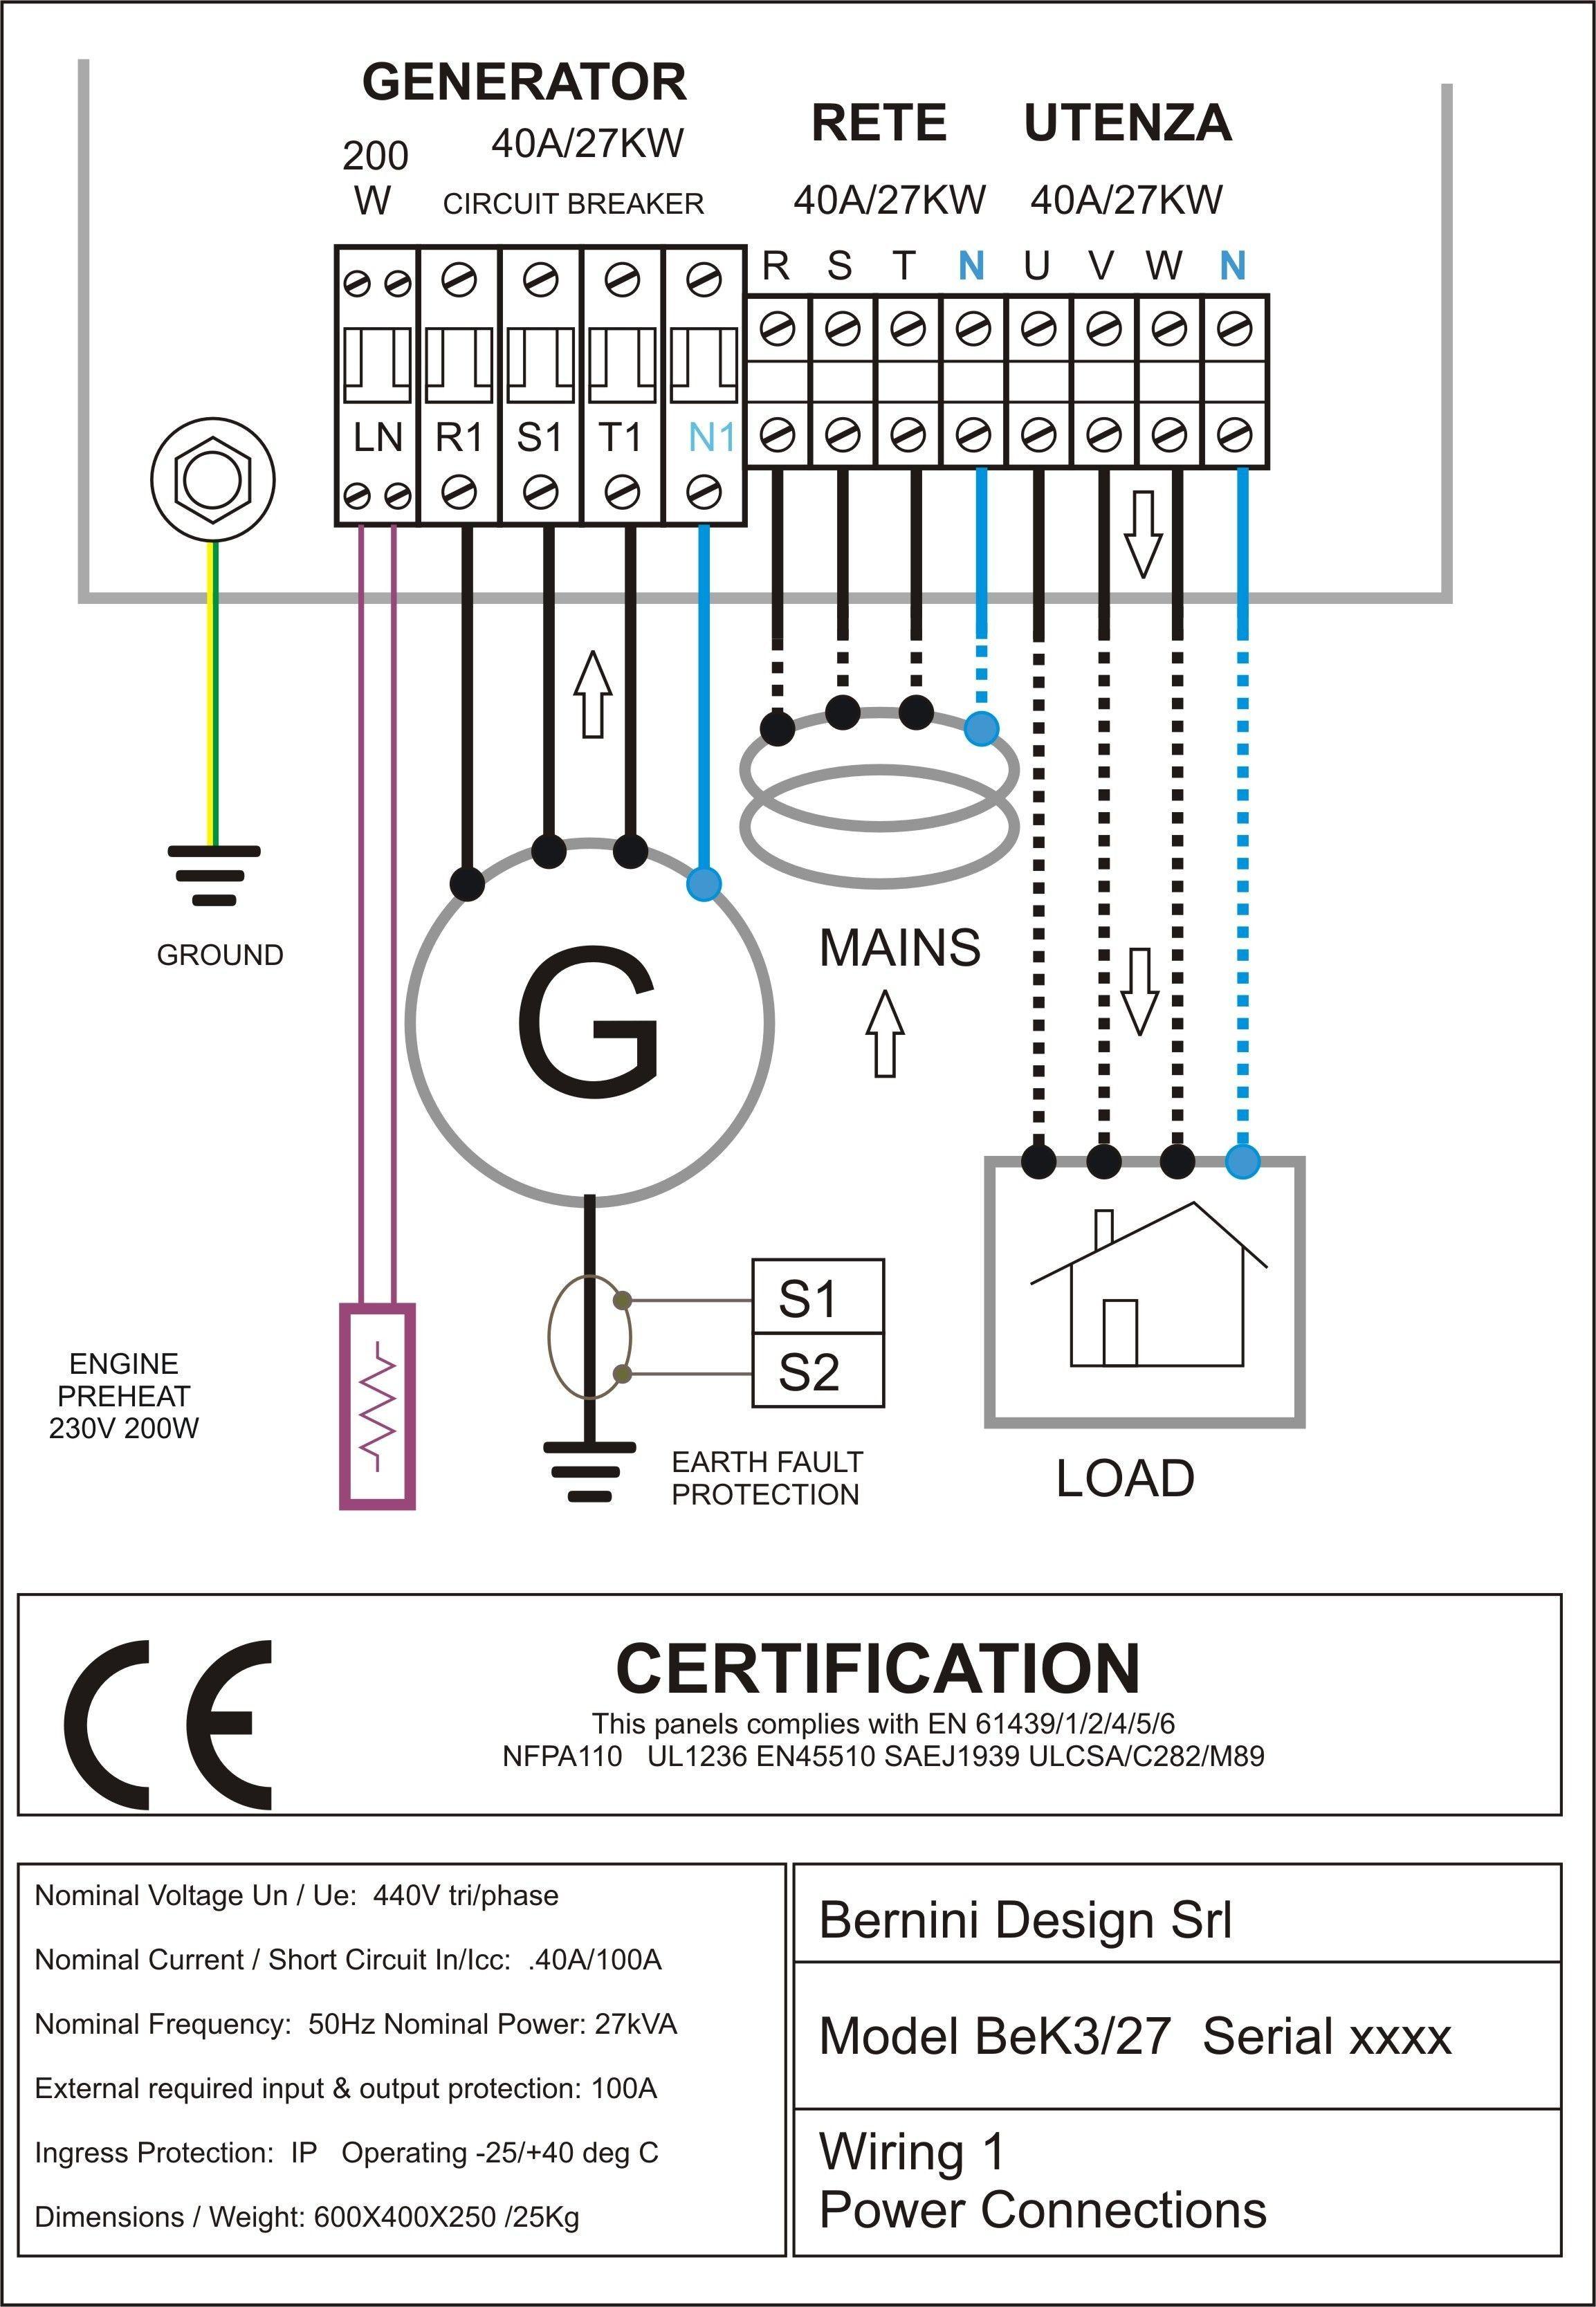 New Mitsubishi Generator Wiring Diagram Diagram Diagramsample Diagramtemplate Wiringdiagram Diagramchar Electrical Circuit Diagram Diagram Circuit Diagram